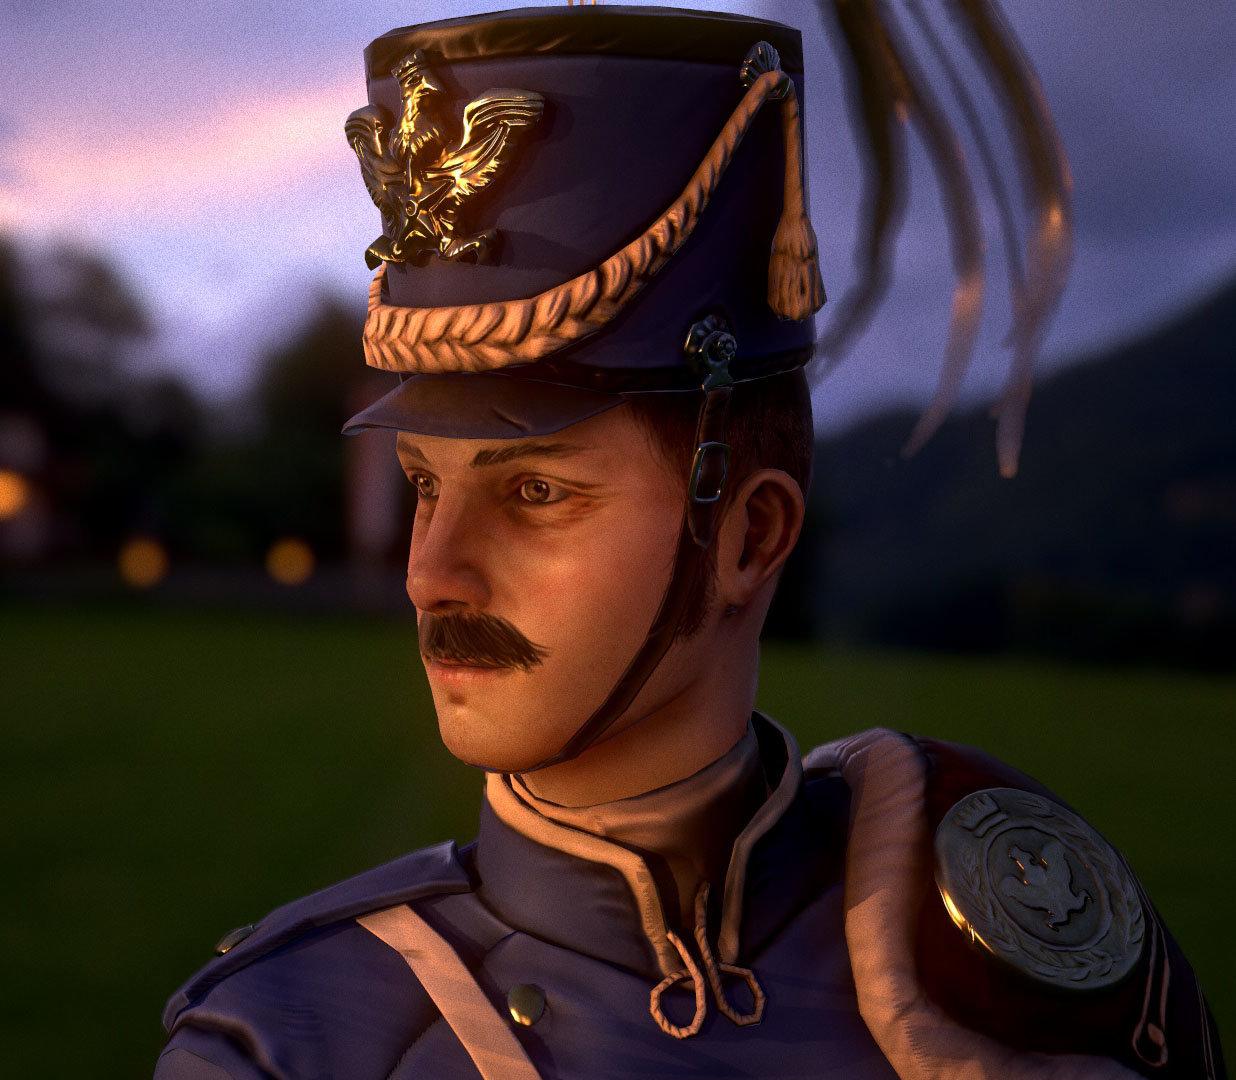 Luis santander soldier 4